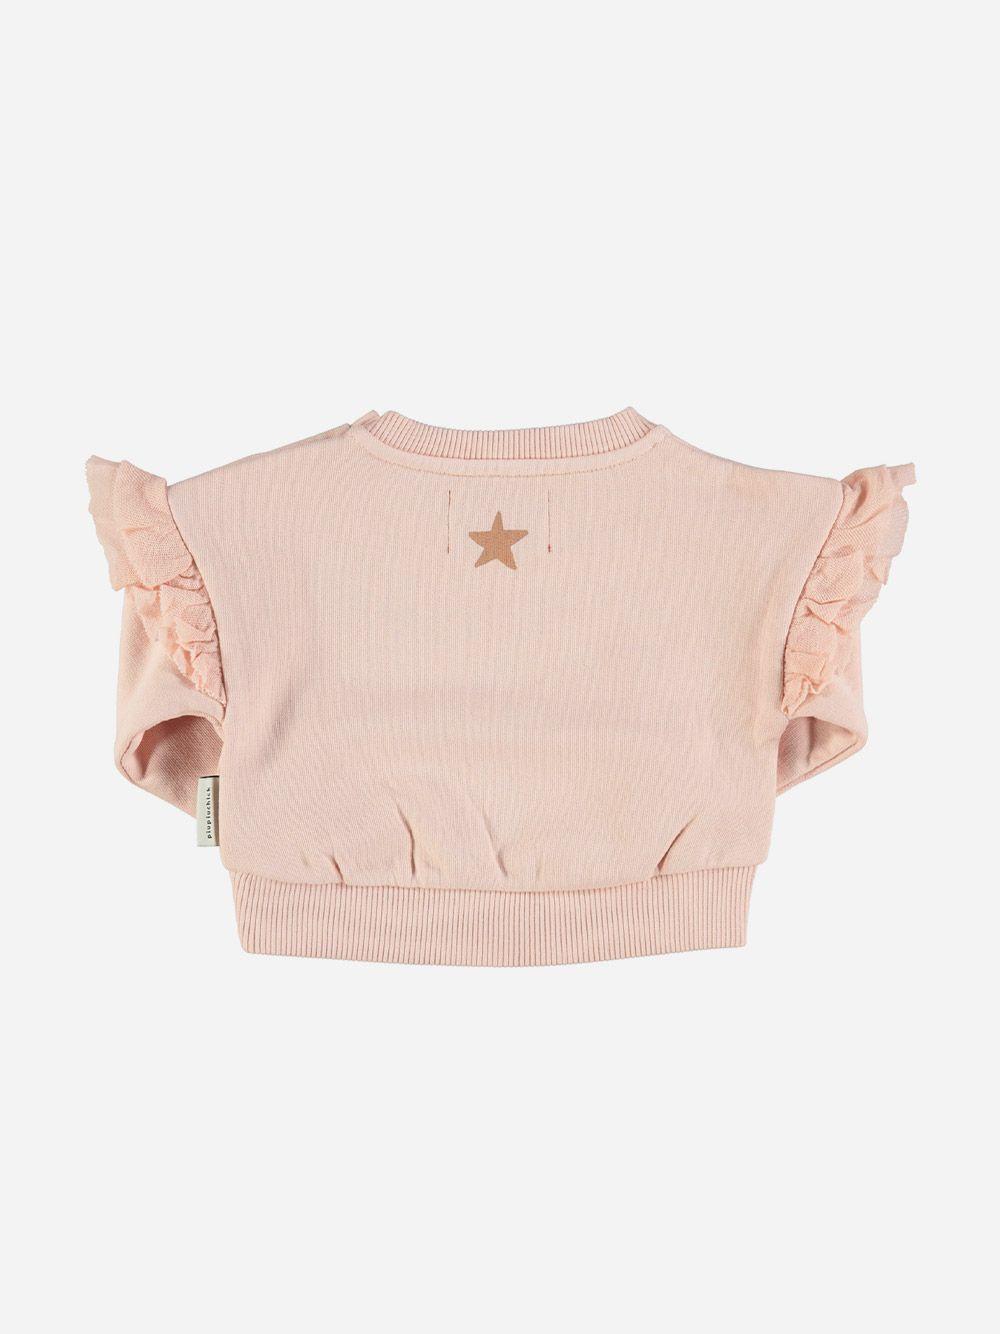 Baby sweatshirt with Frills on Shoulders